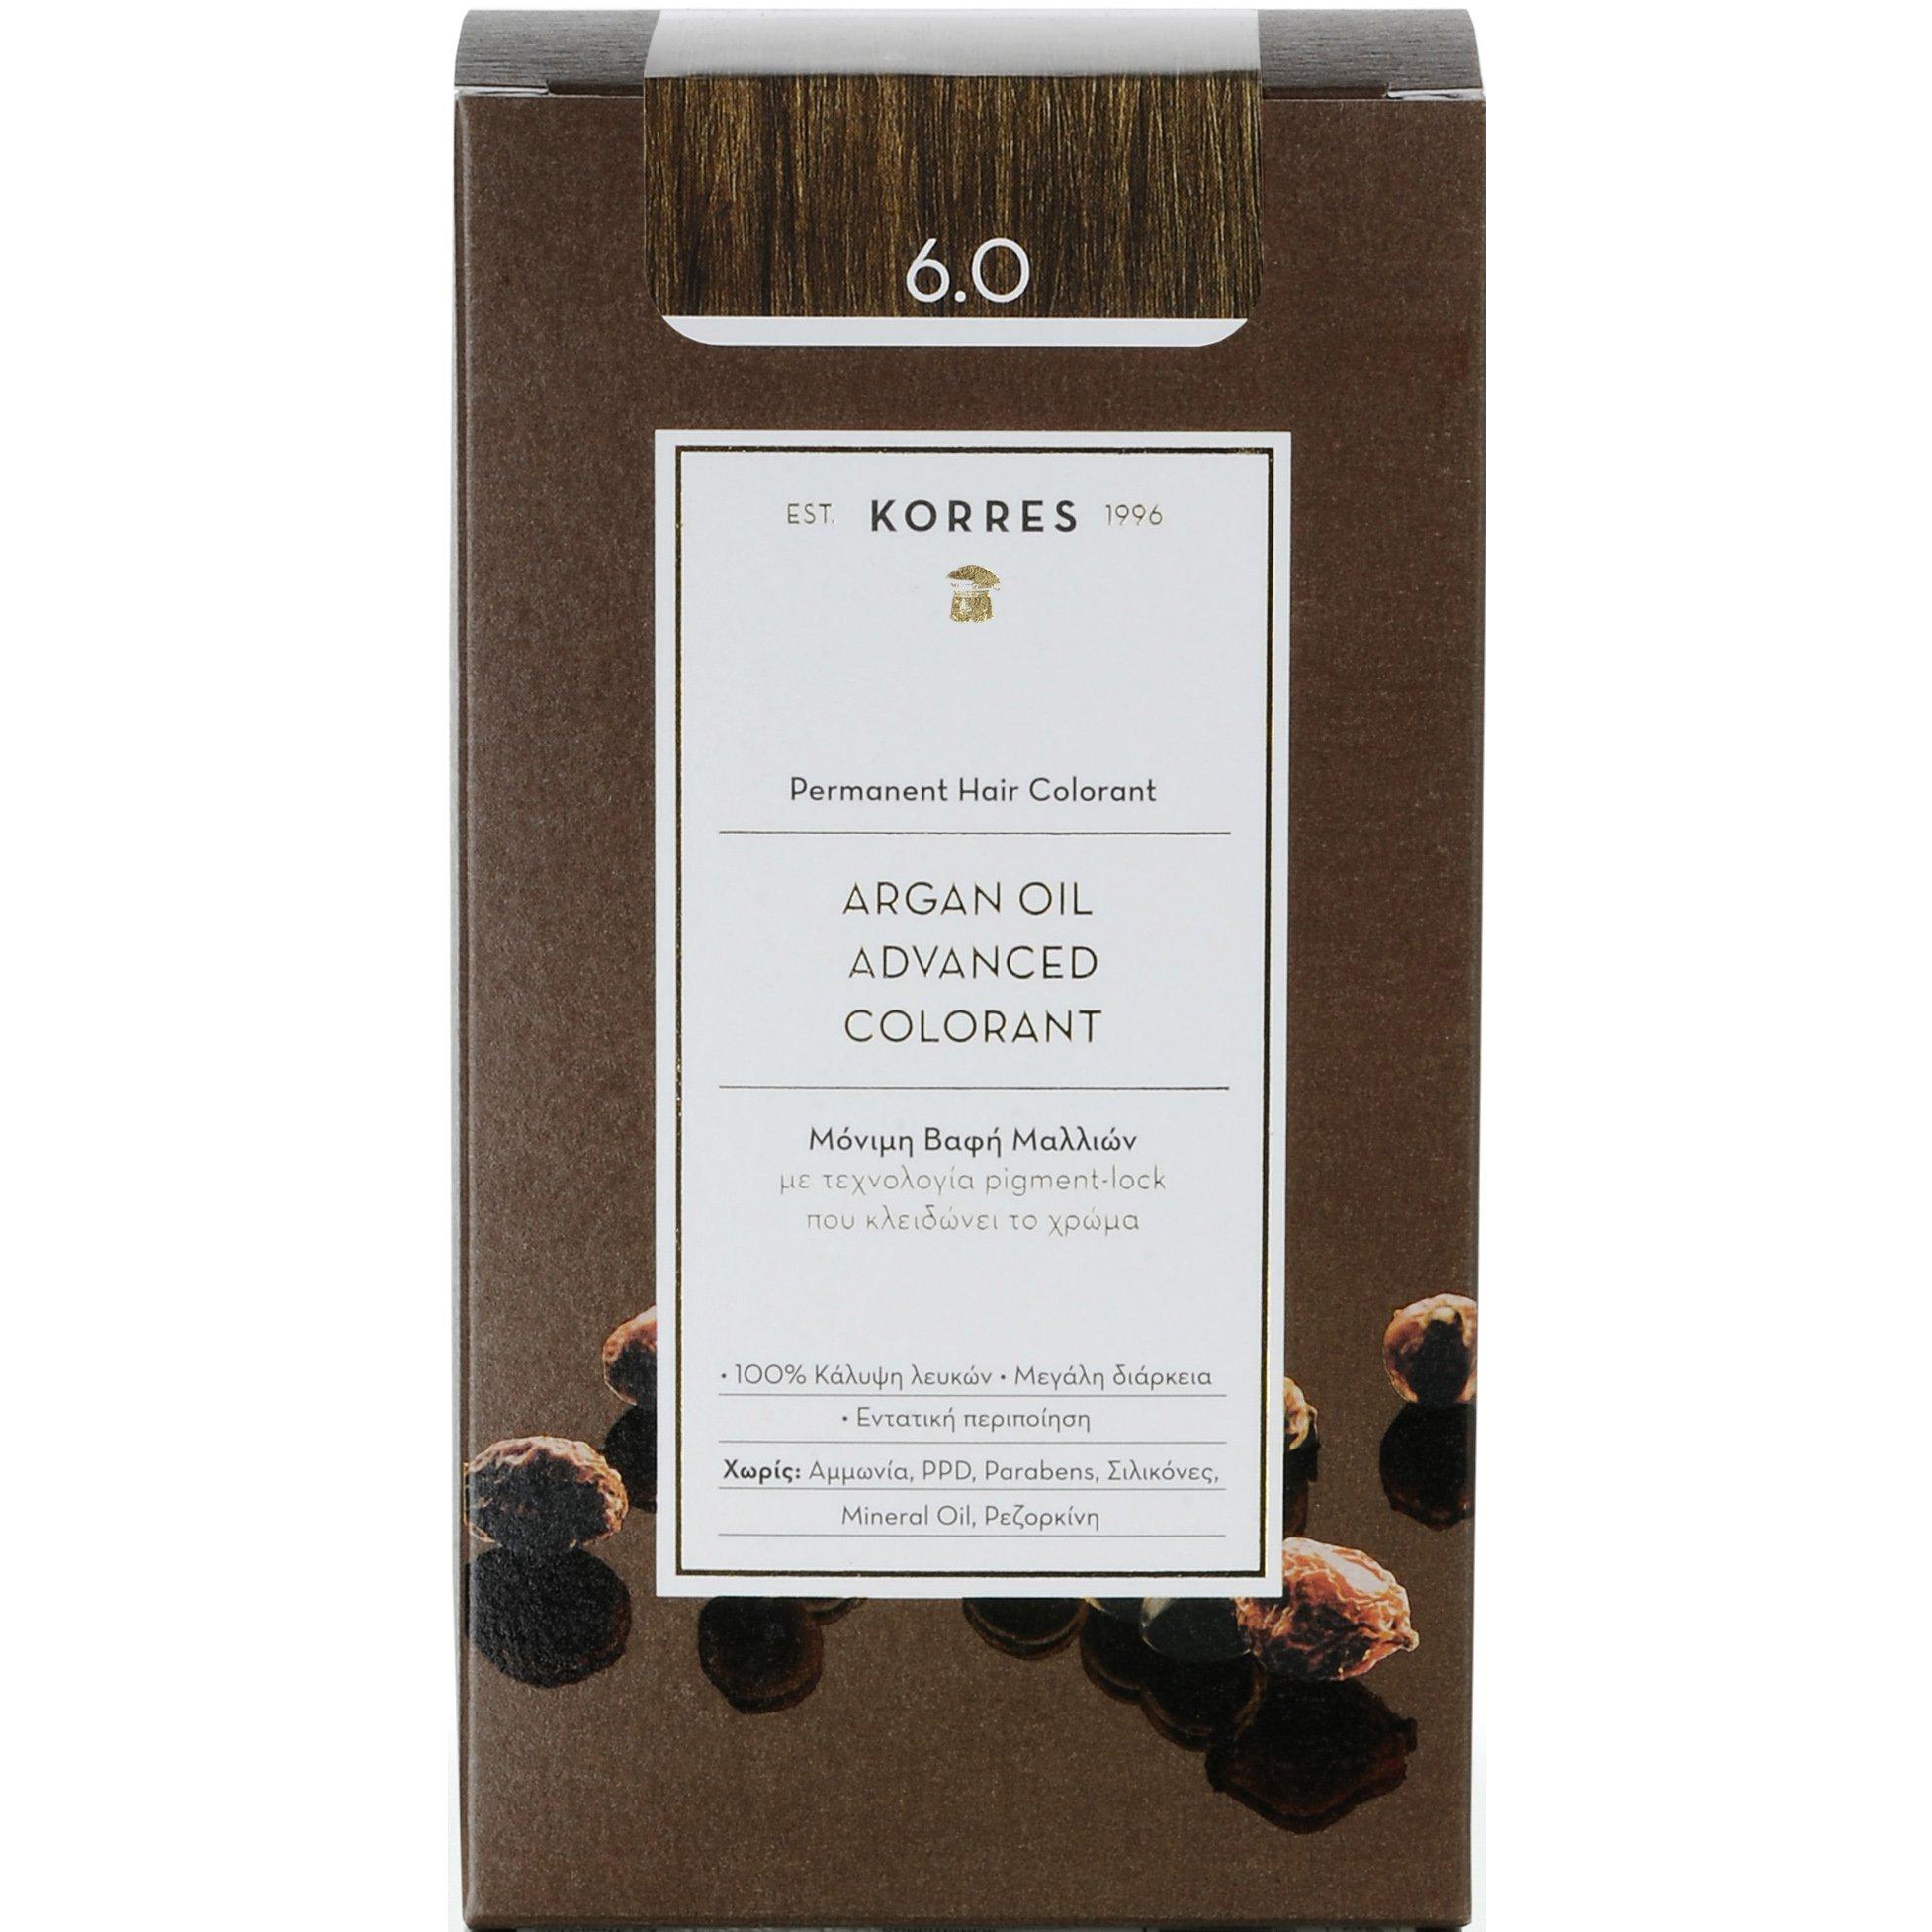 Korres Argan Oil Advanced Colorant Μόνιμη Βαφή Μαλλιών με Τεχνολογία Pigment-Lock που Κλειδώνει το Χρώμα 50ml – 6.0 ΞΑΝΘΟ ΣΚΟΥΡΟ ΦΥΣΙΚΟ